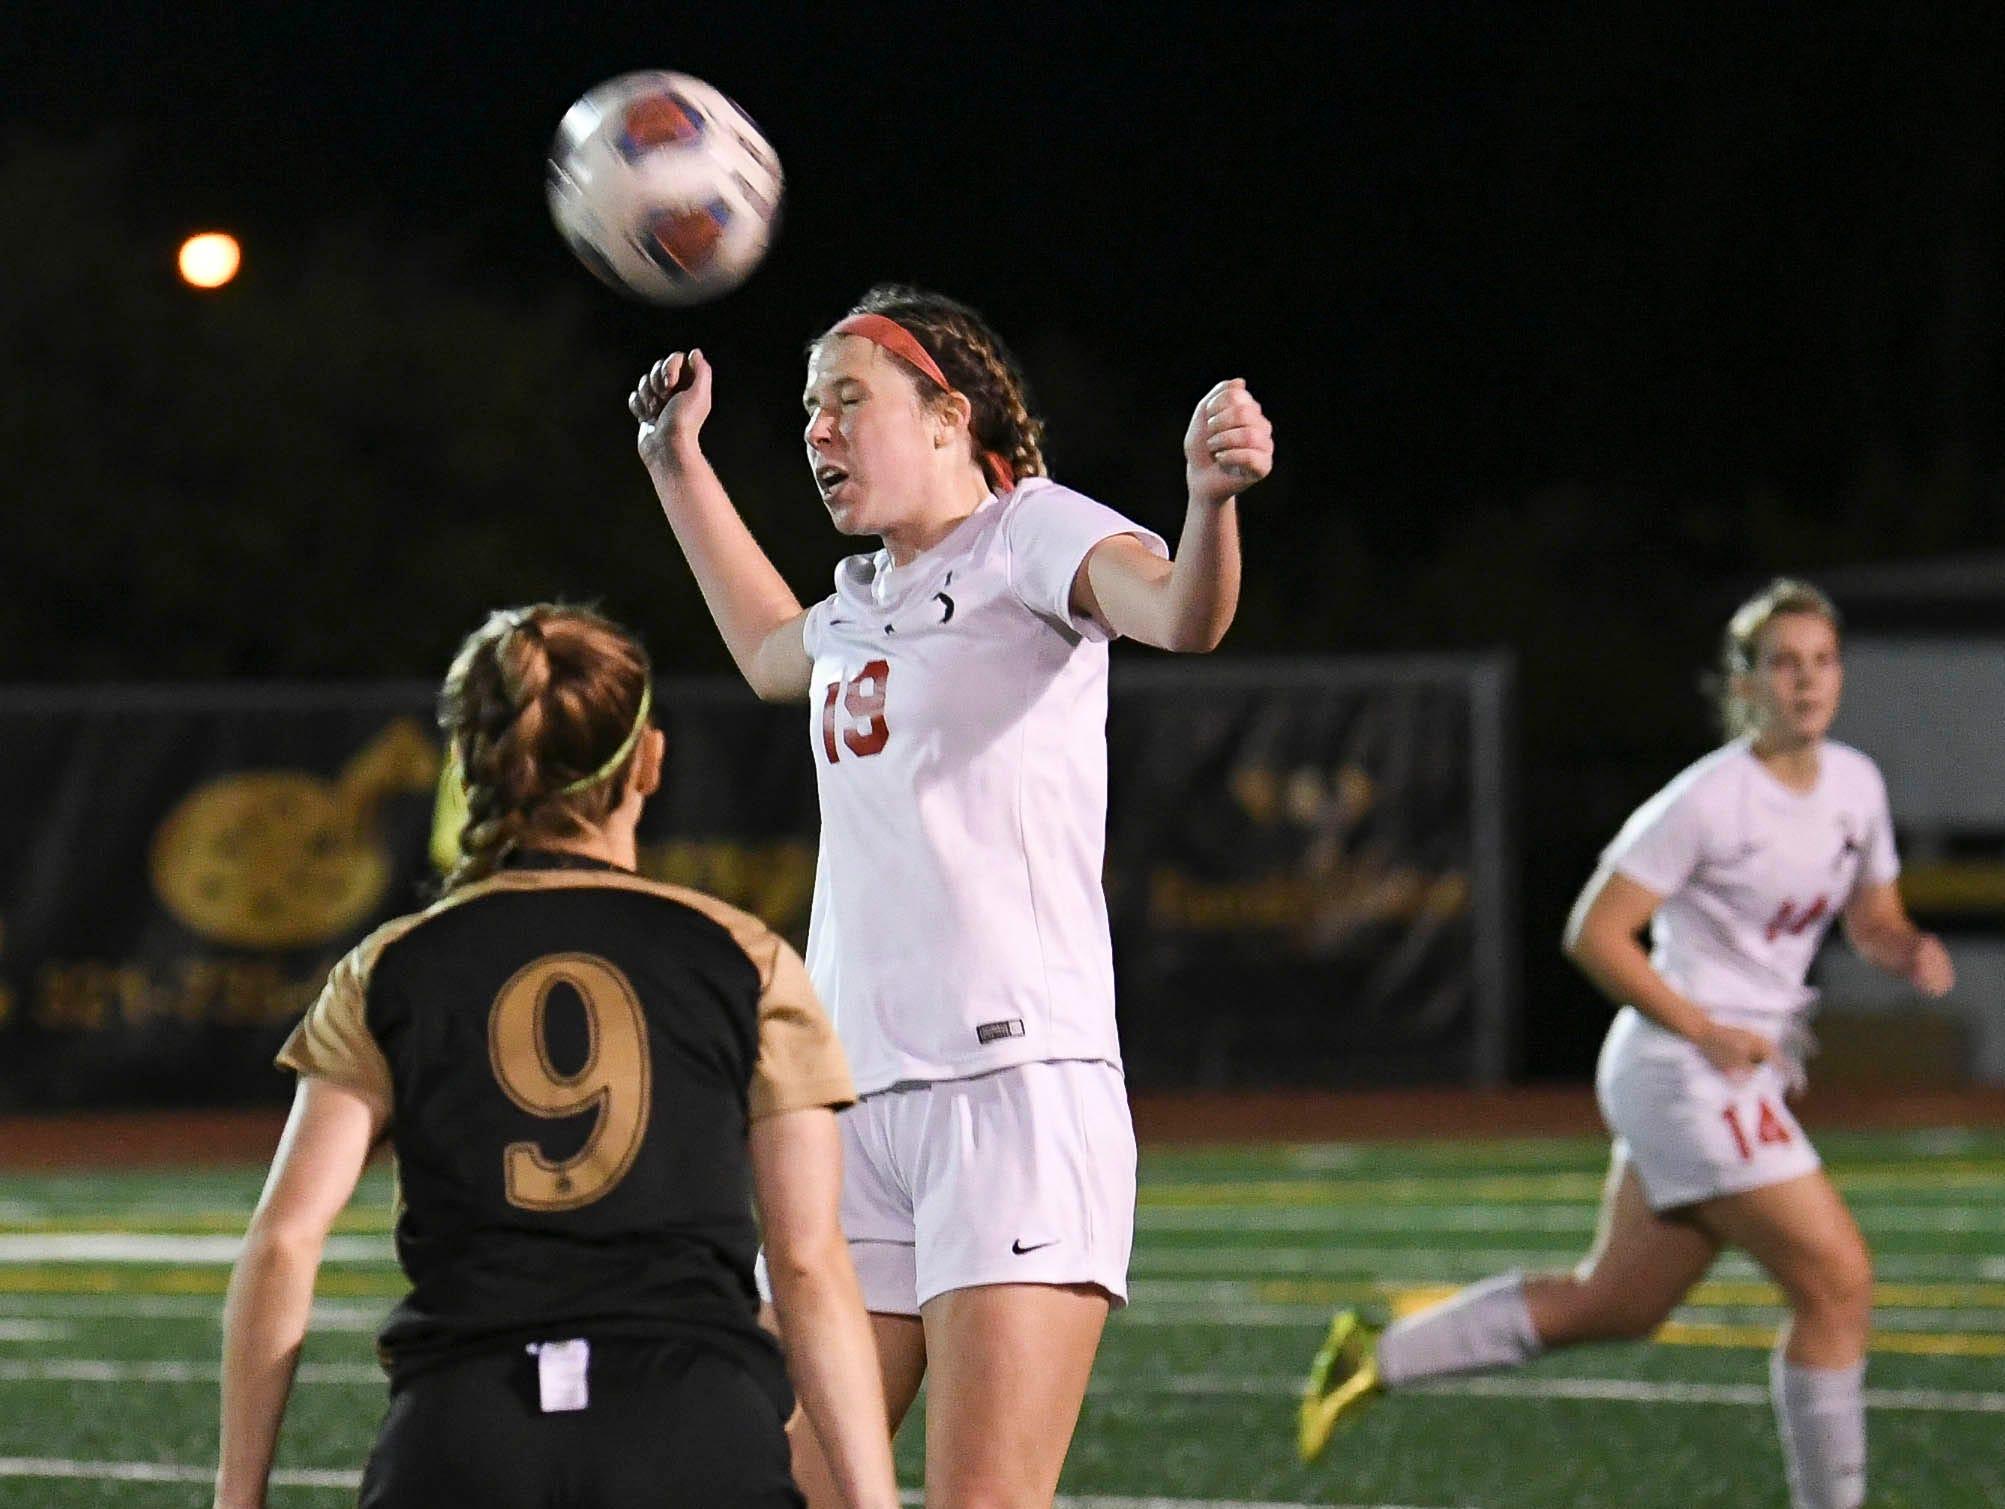 Satellite's Abigail Ferguson heads the ball away from Maddie Murphy of Merritt Island during Friday's Class 3A regional semifinal at Merritt Island High